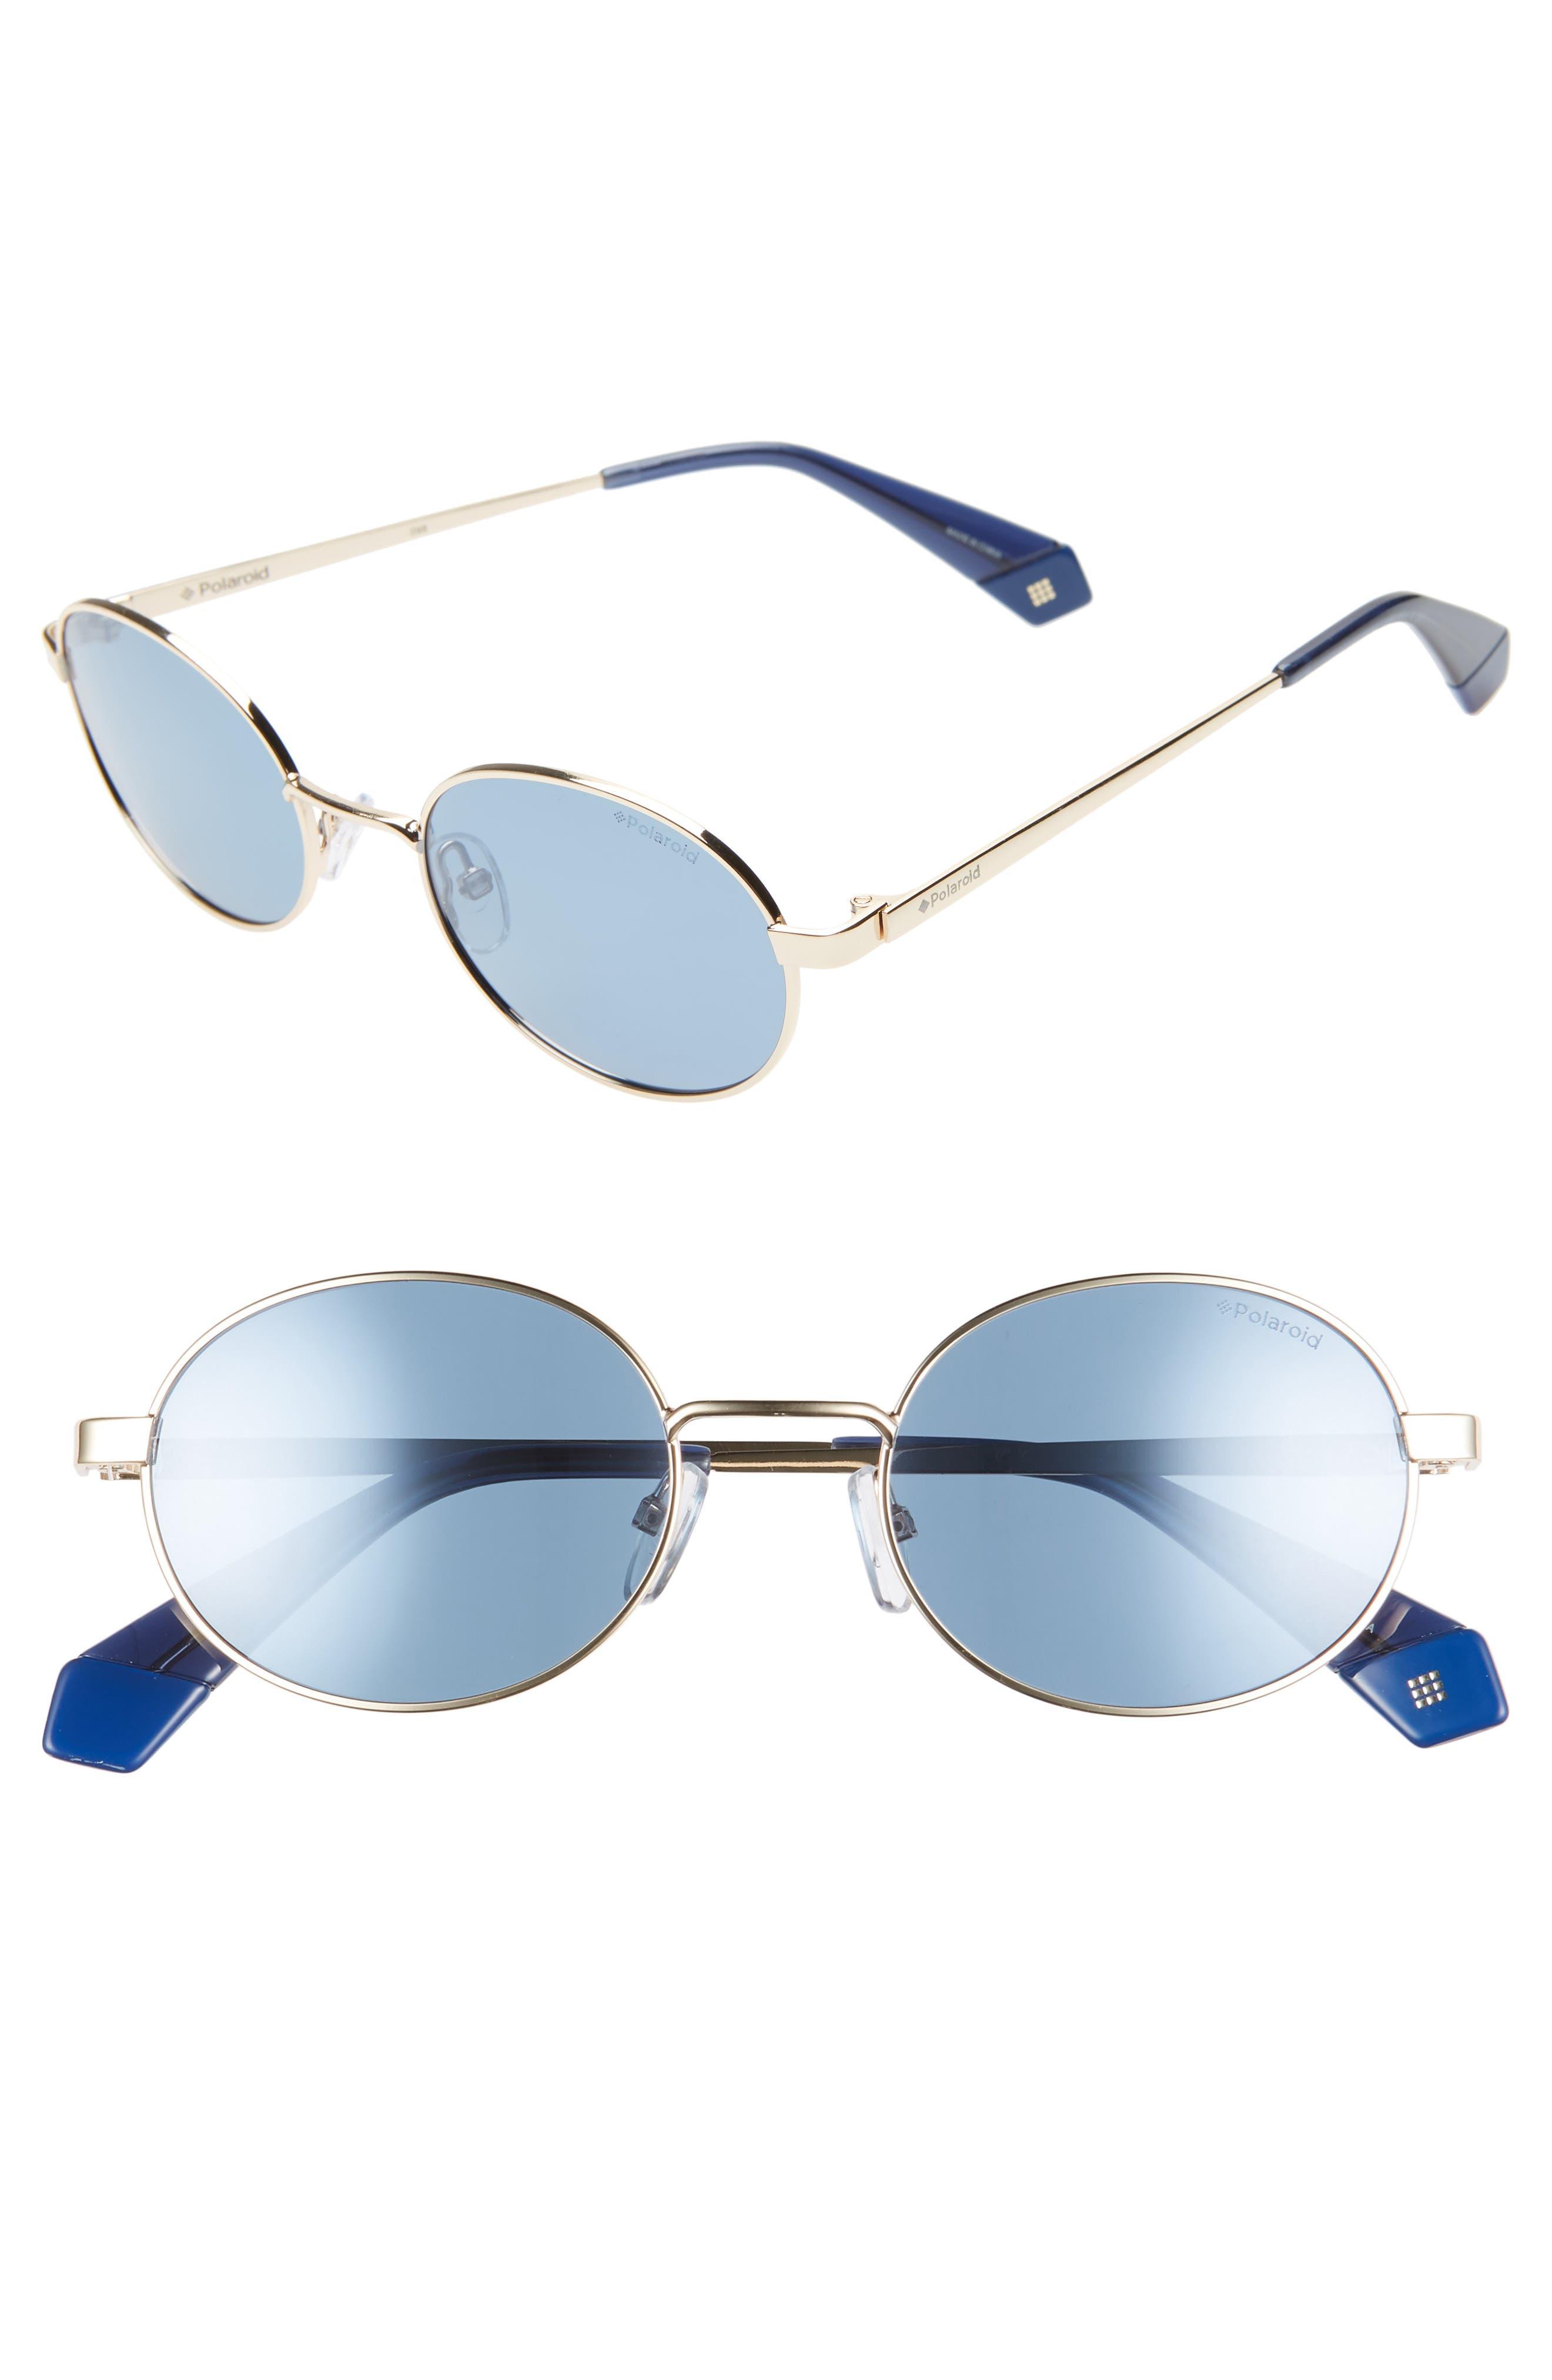 Polaroid 51Mm Polarized Round Sunglasses - Gold/ Blue